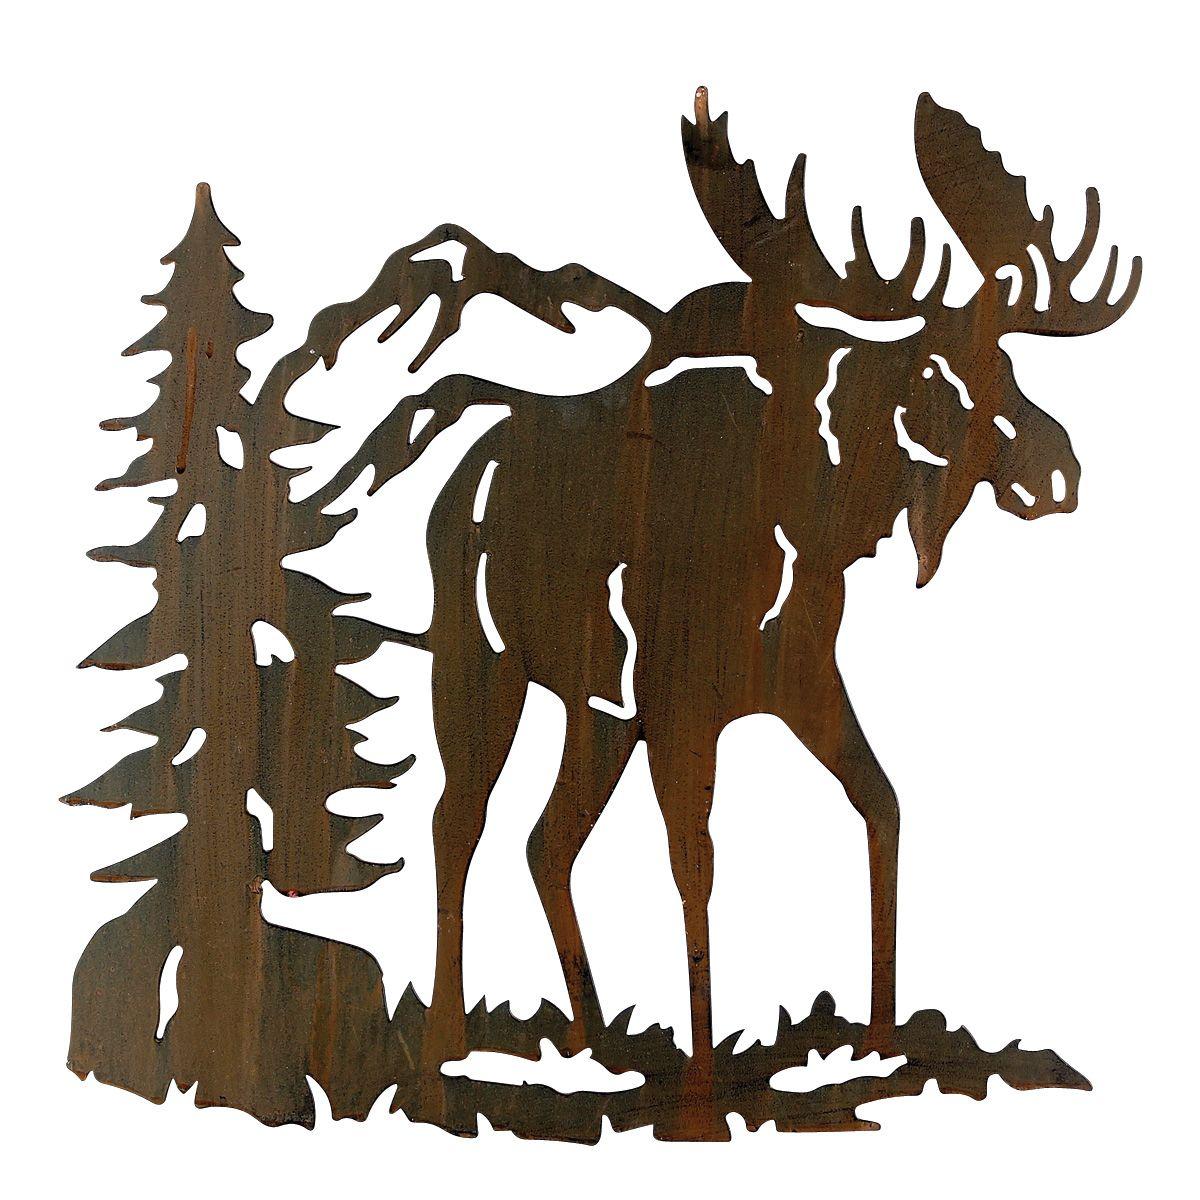 Moose Metal Art Wall Hanging Moose Wall Art Hanging Wall Art Black Forest Decor